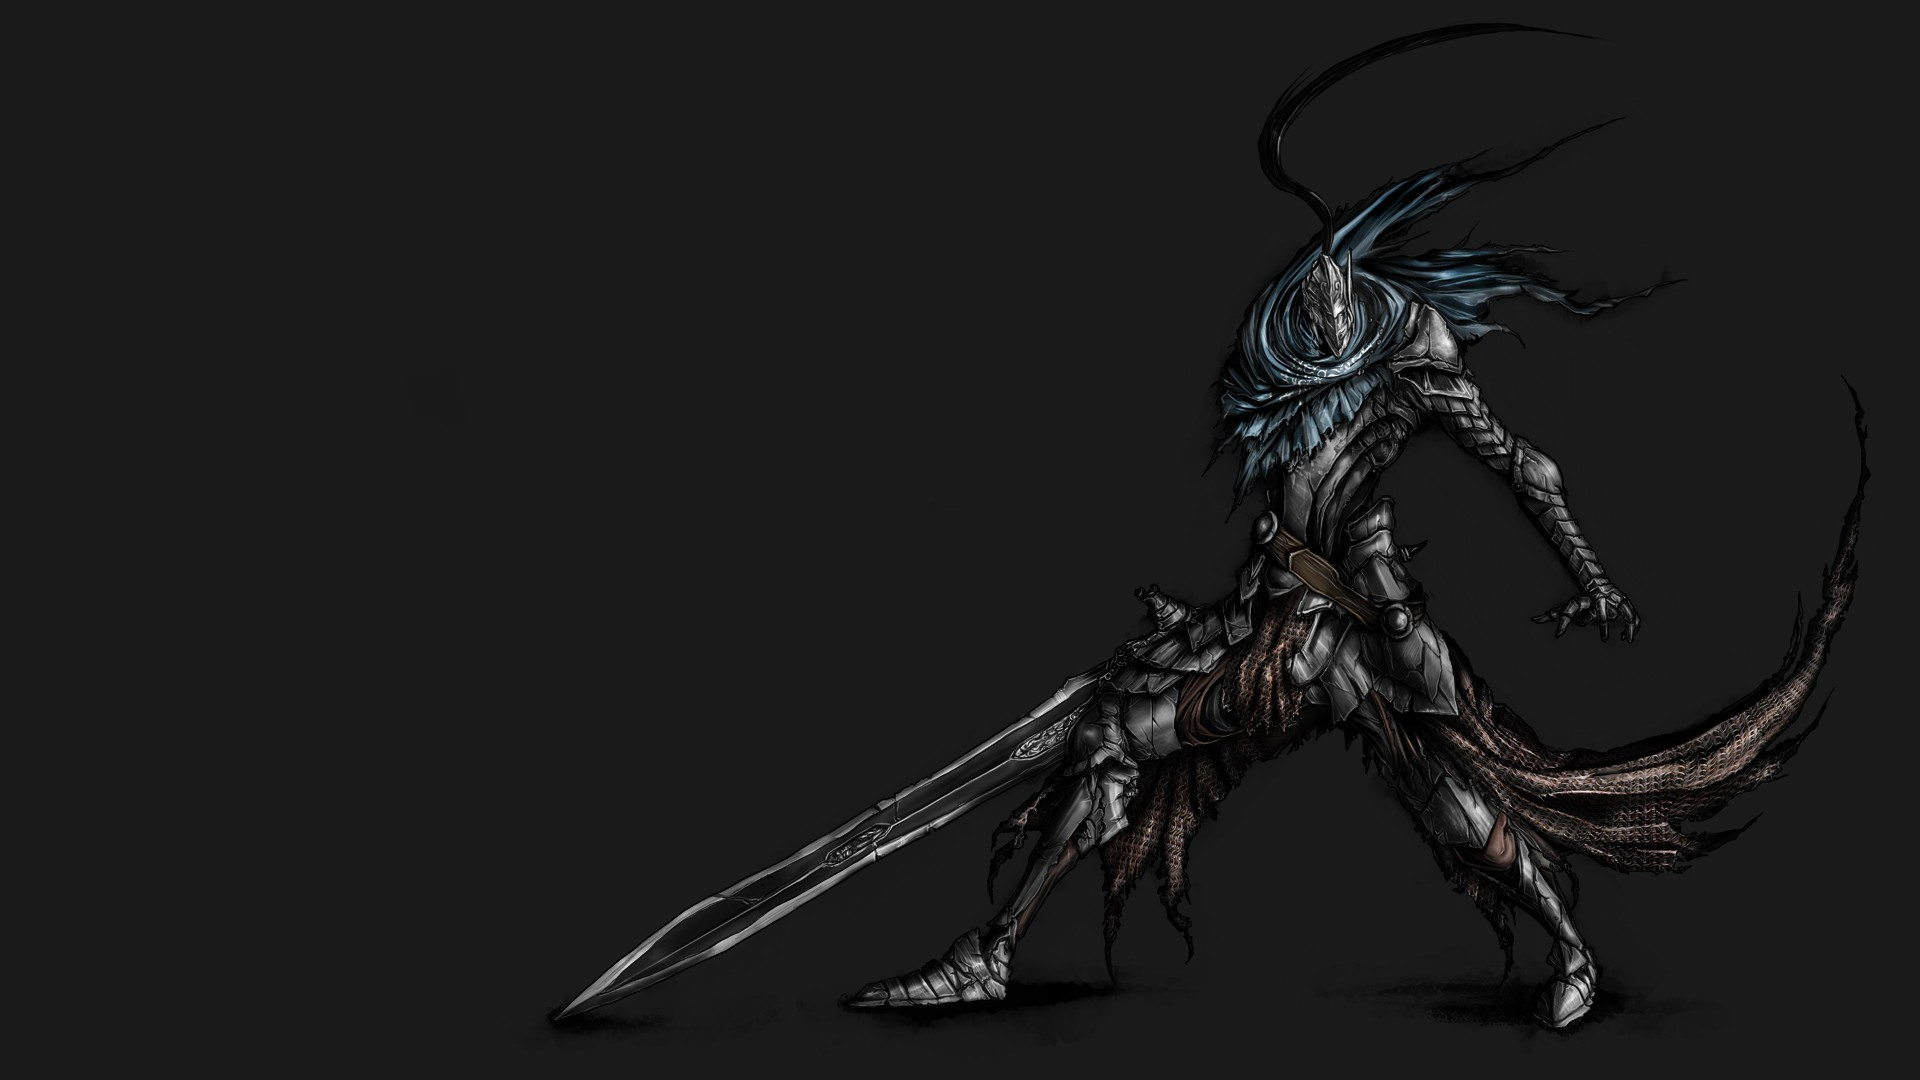 Animation Artorias The Abysswalker Dark Souls Helmets Masks Simple  Background Unrealistic Warriors Weapons …